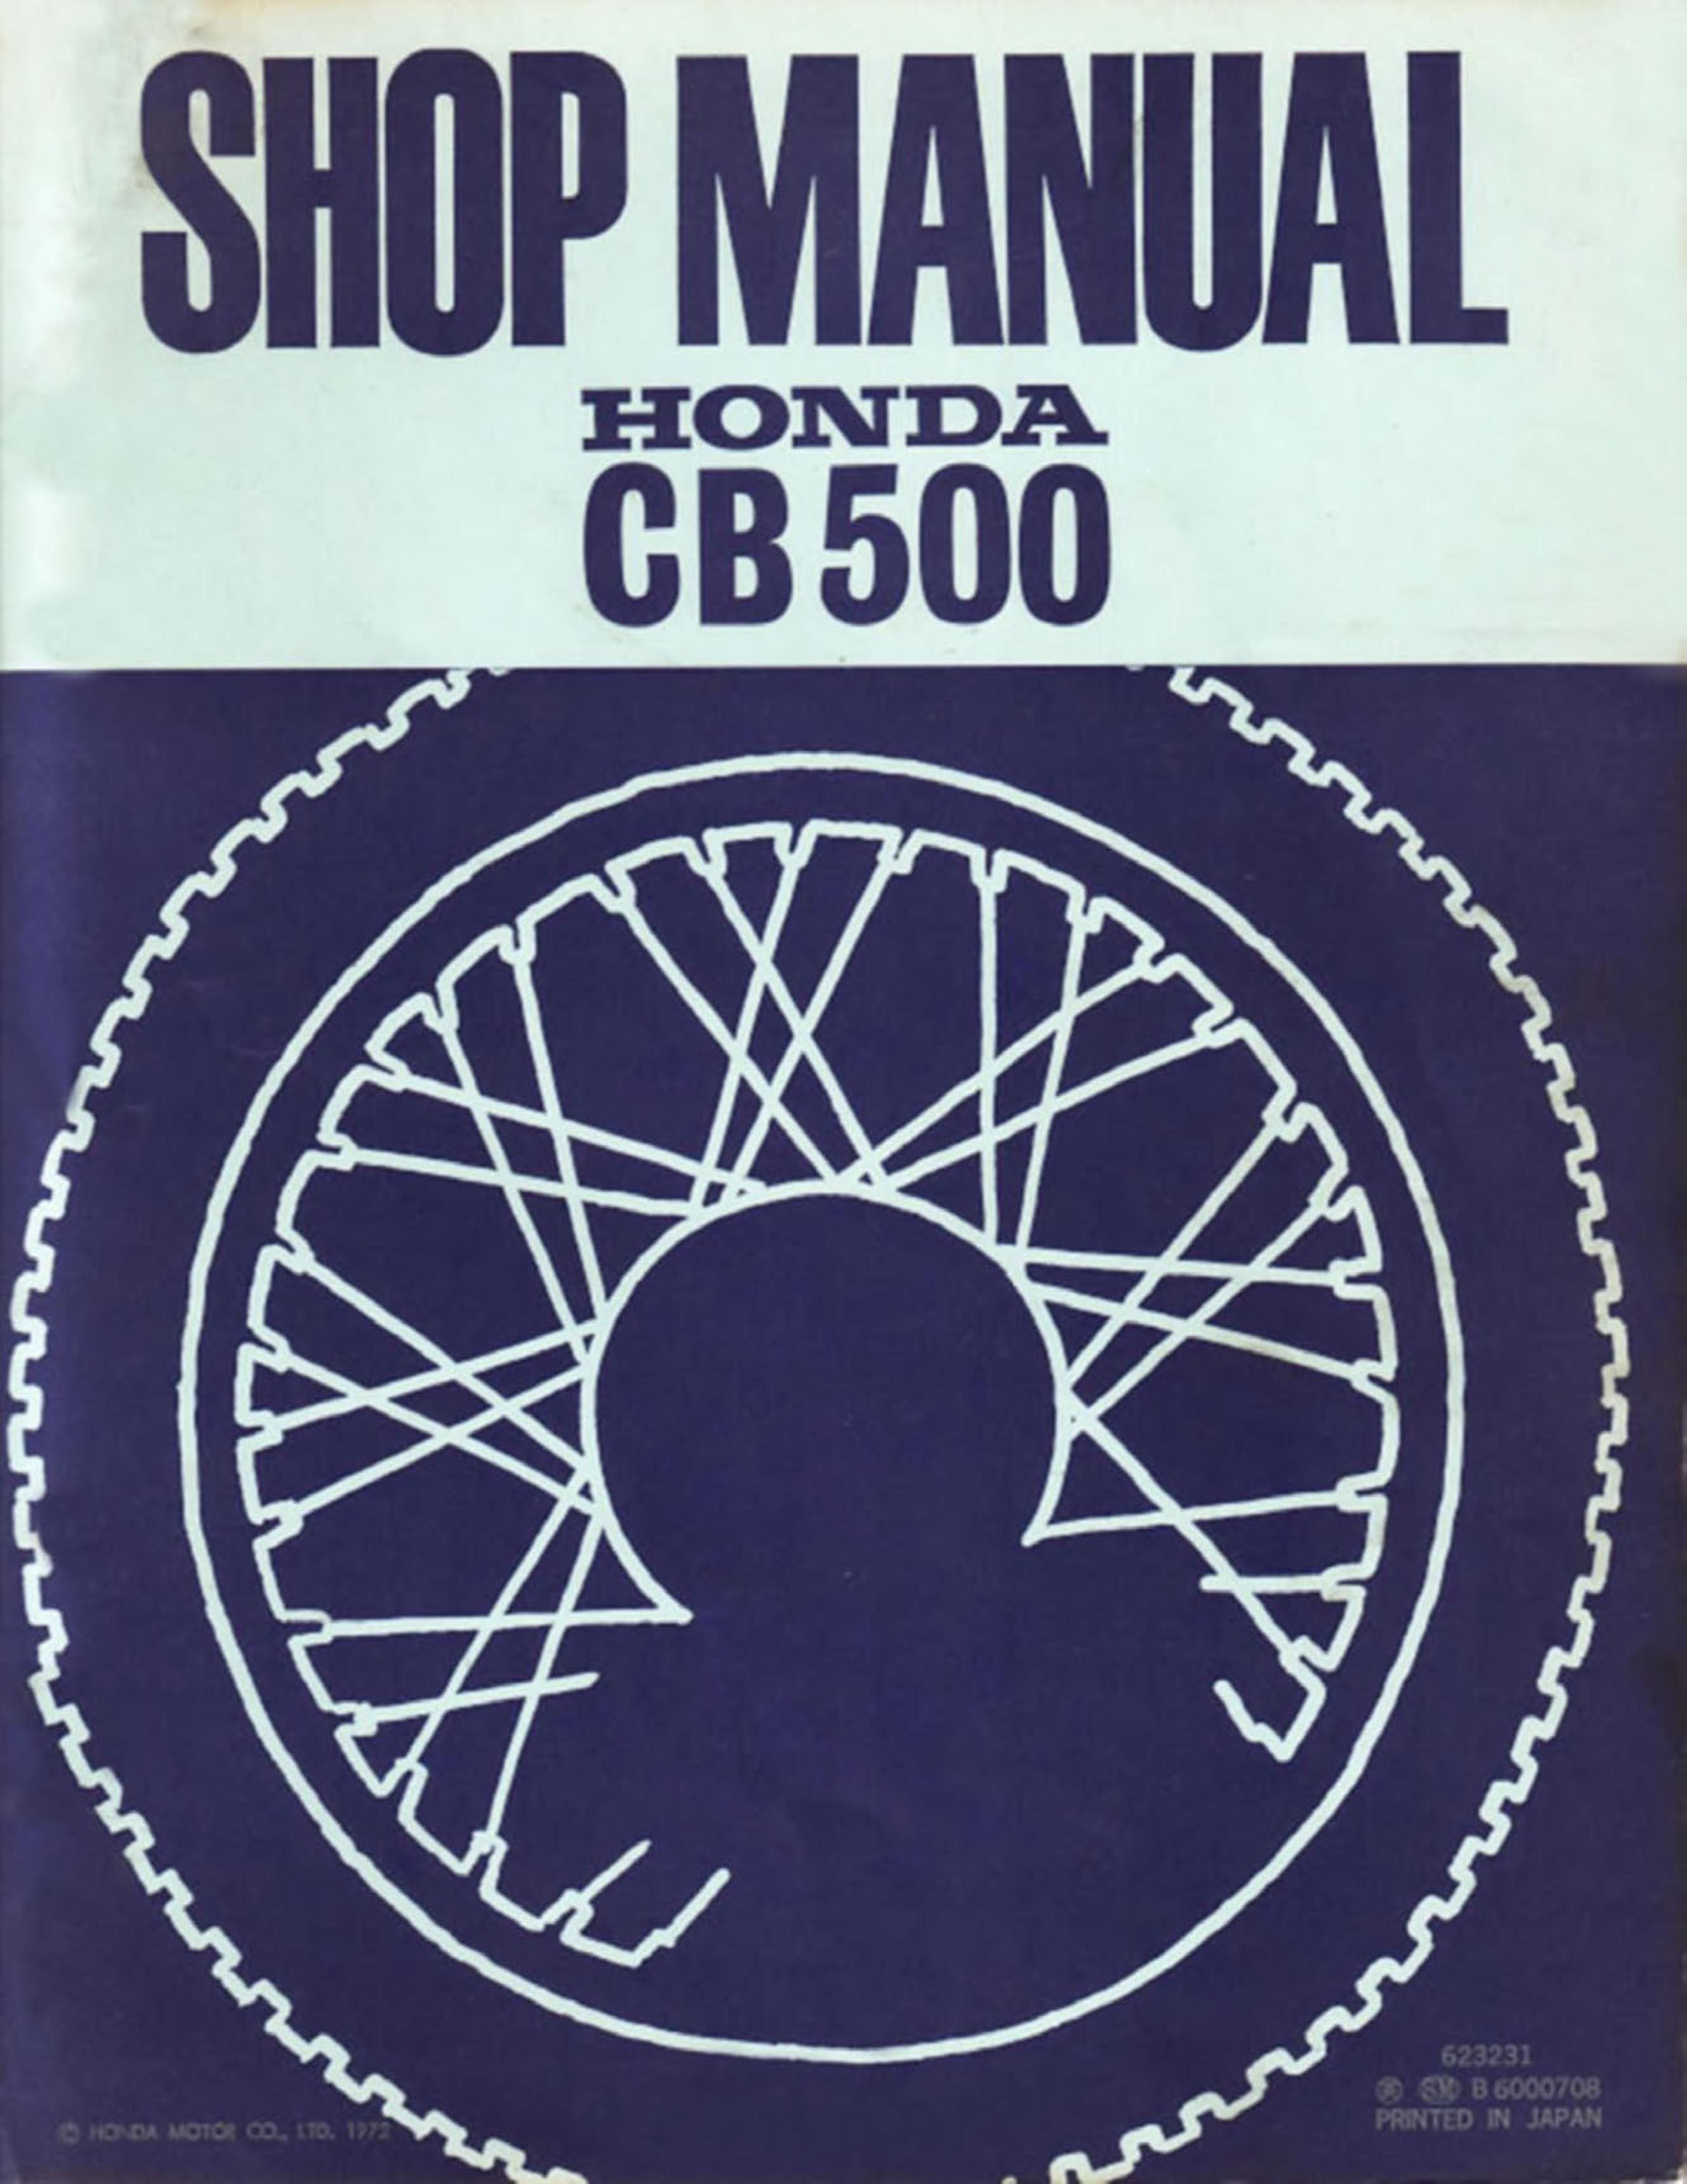 cb500f service manual pdf